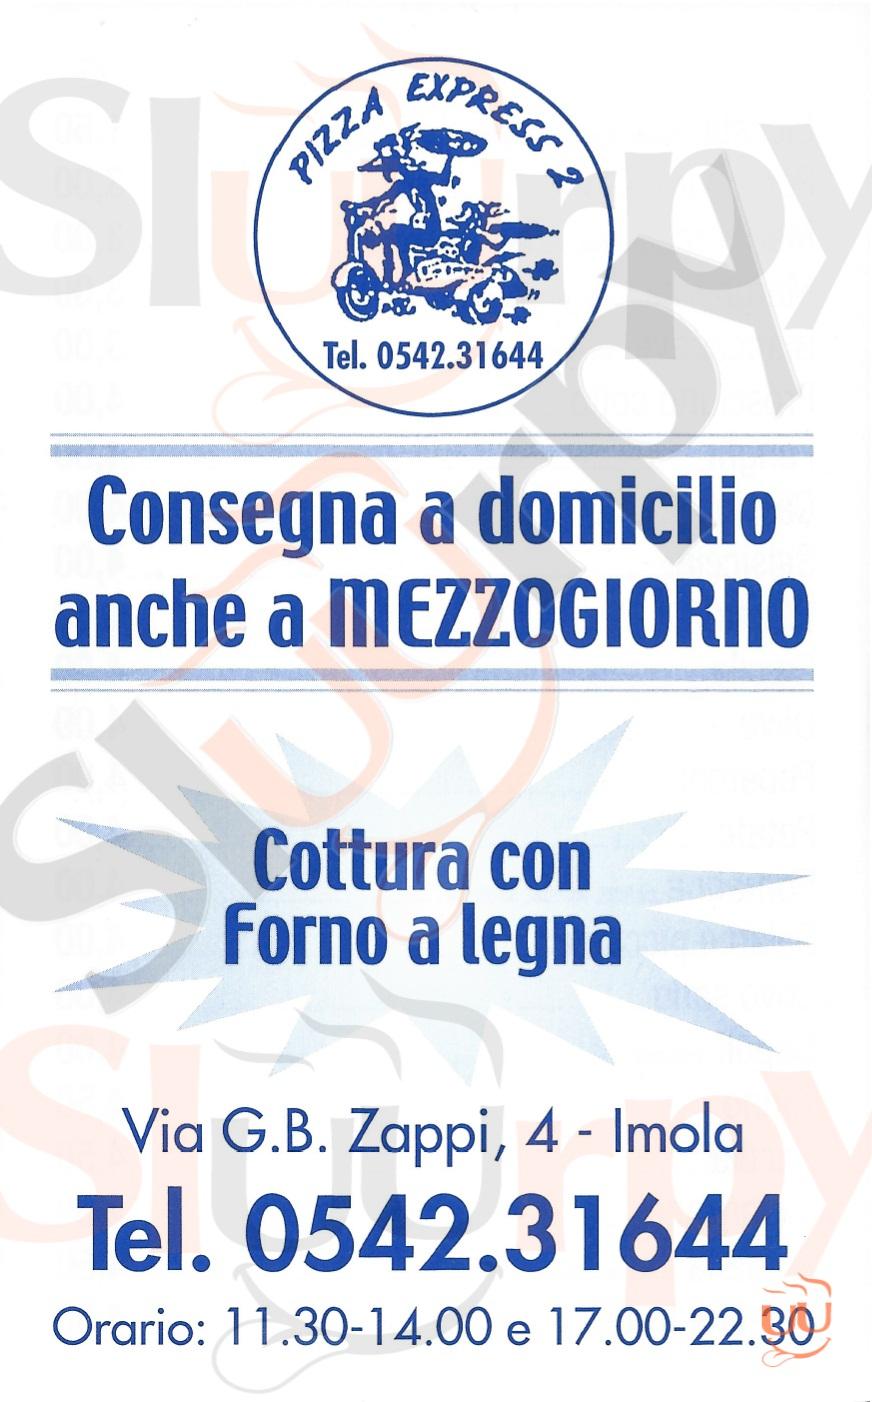 PIZZA EXPRESS 2 Imola menù 1 pagina